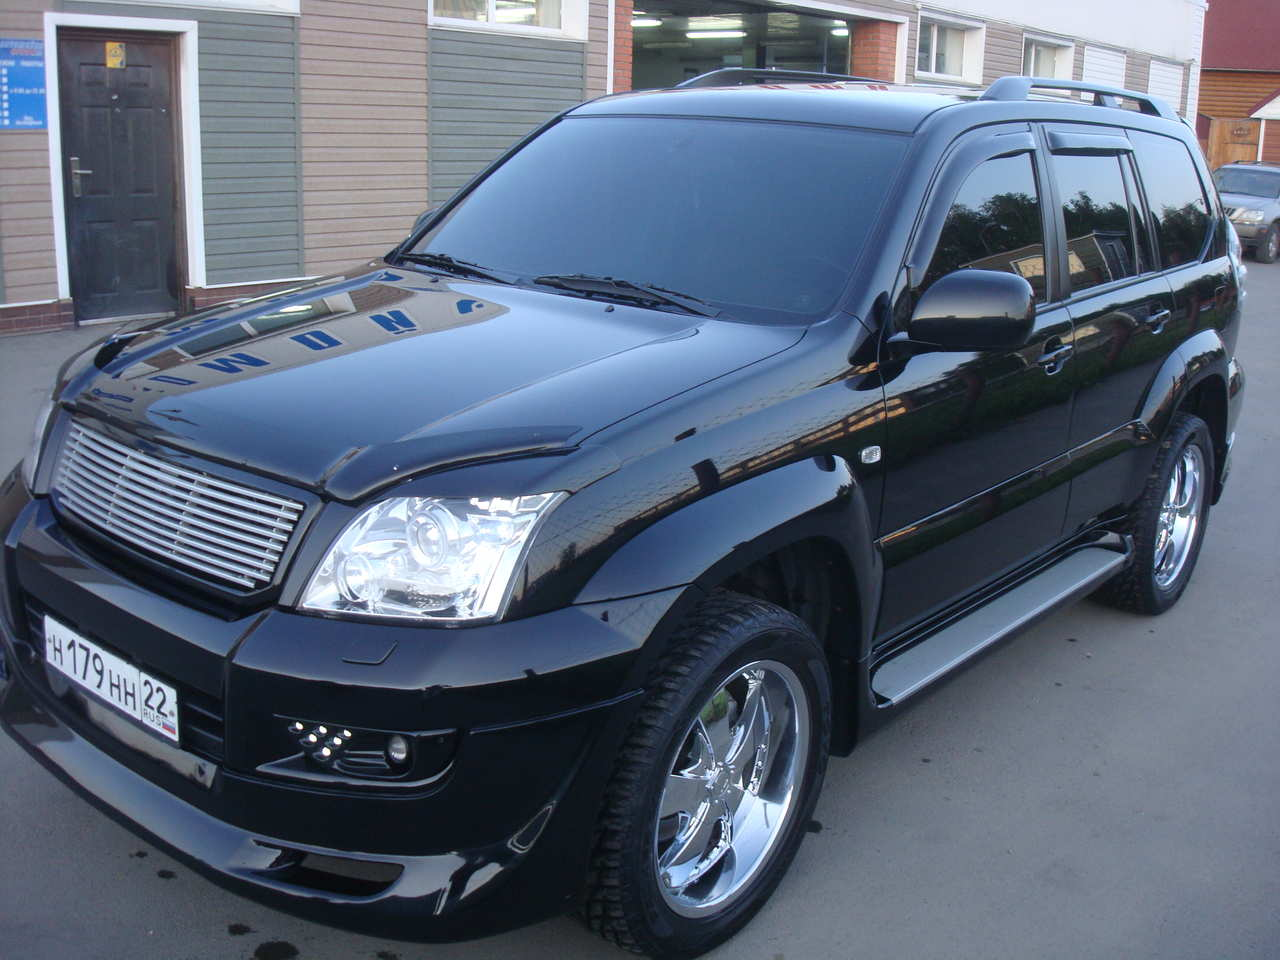 2006 toyota land cruiser prado pictures gasoline automatic for sale. Black Bedroom Furniture Sets. Home Design Ideas